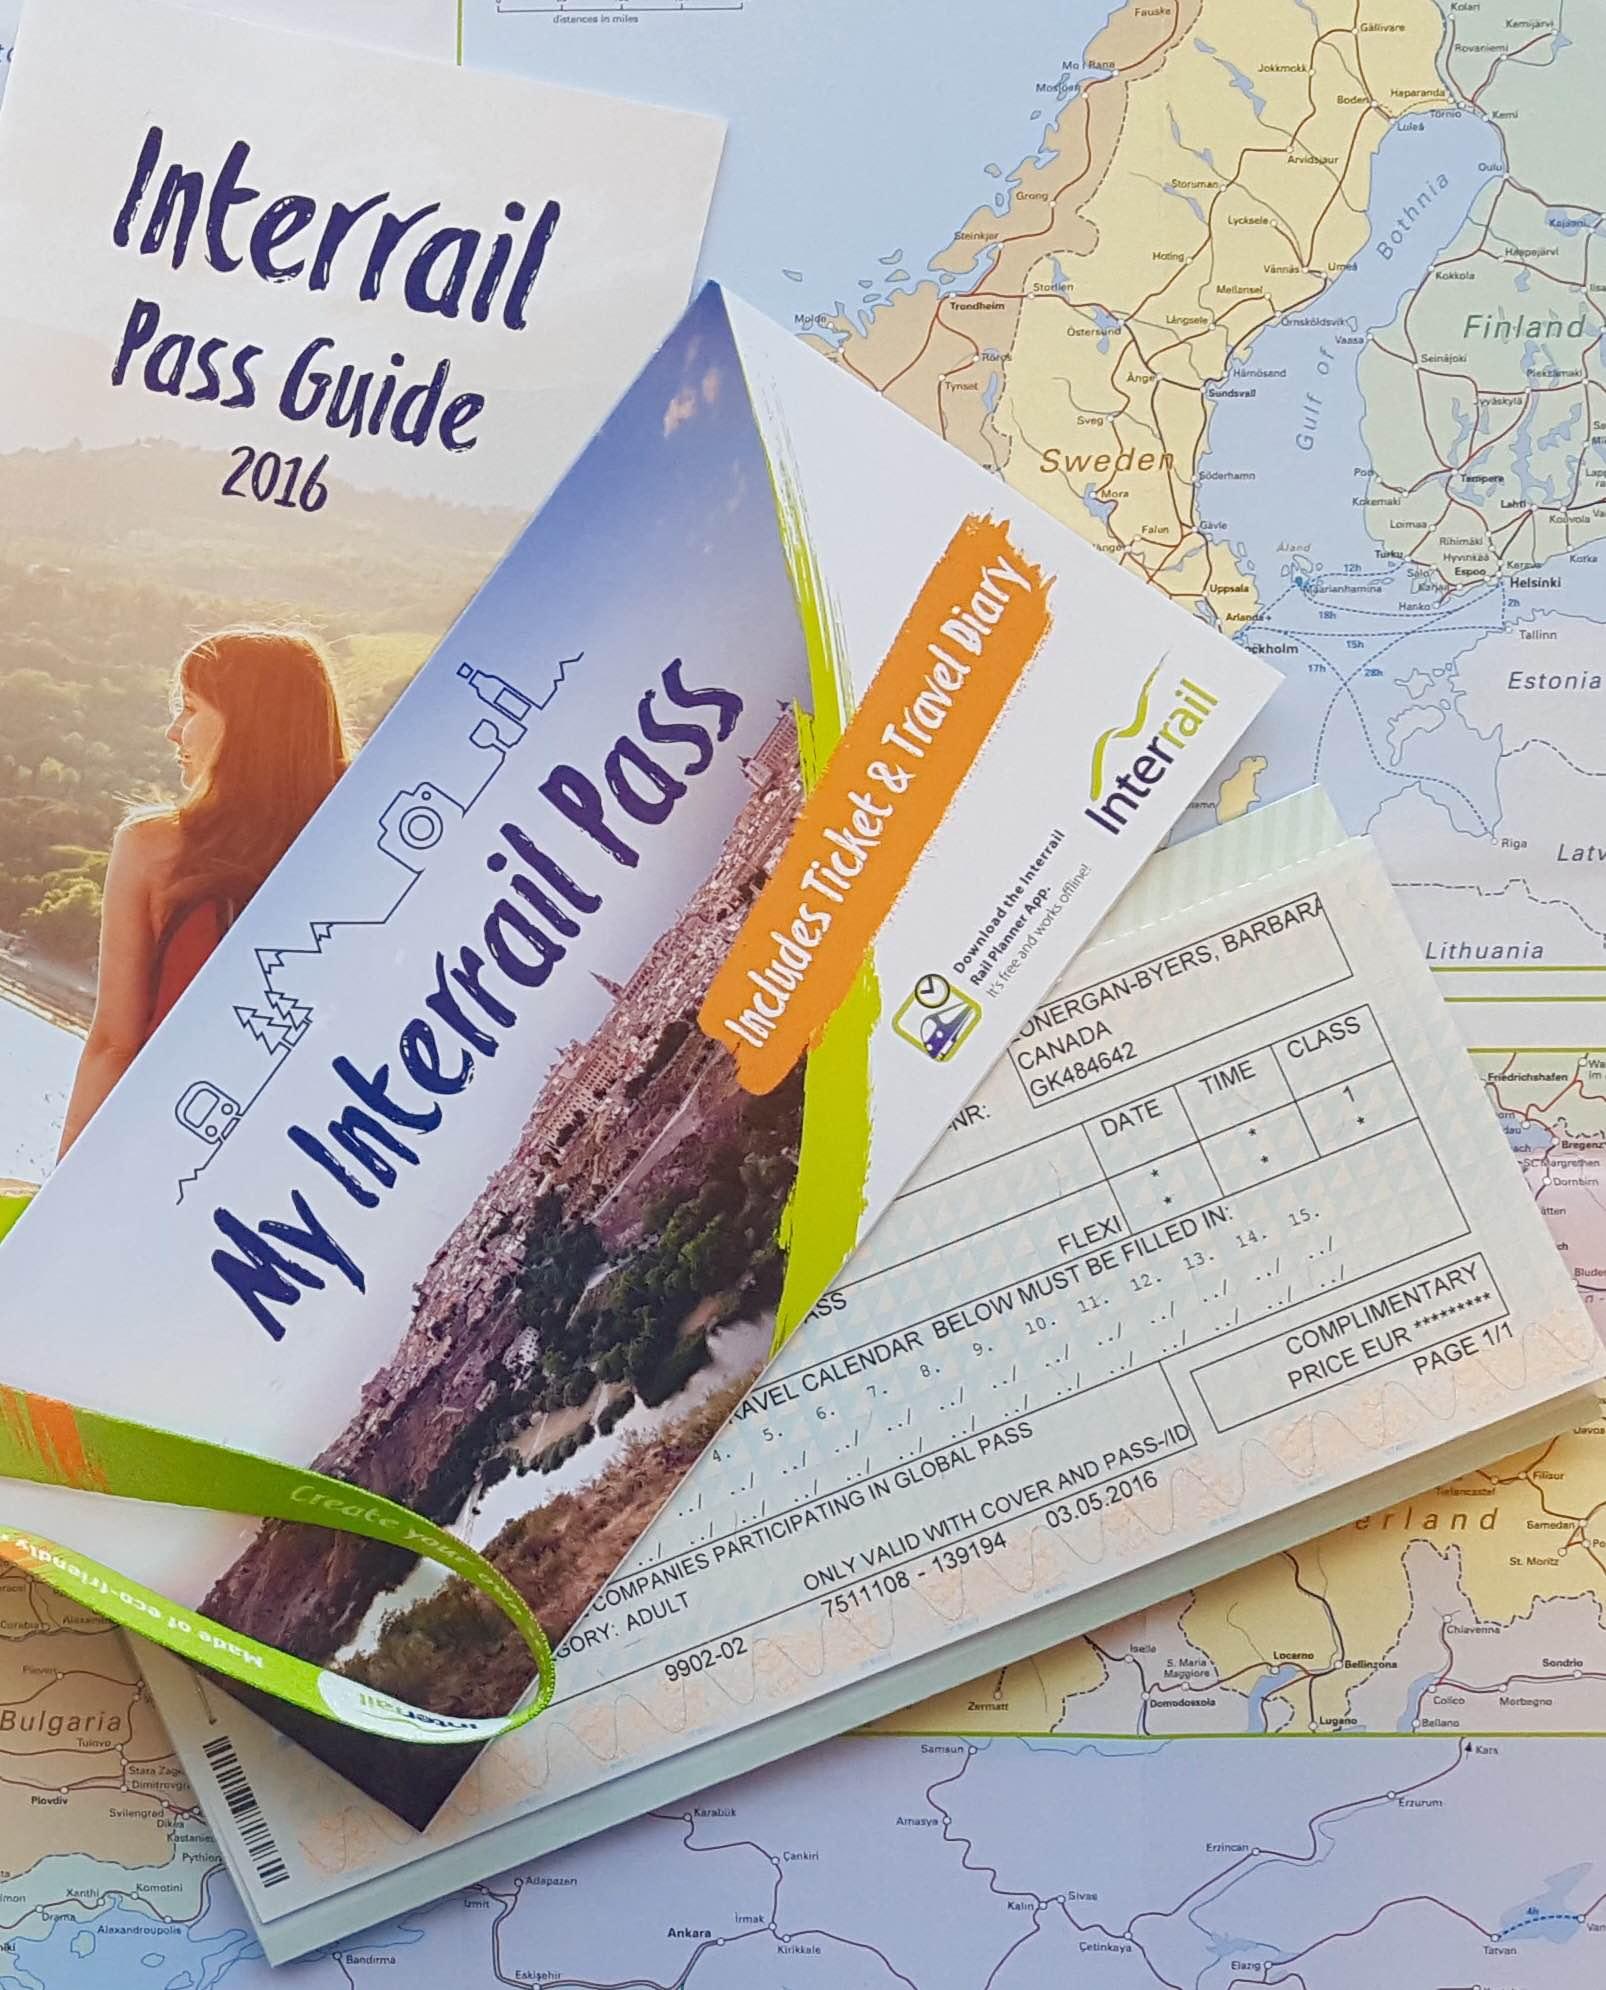 Free Rail Tickets for Irish 18 year olds – Deirdre Clune MEP